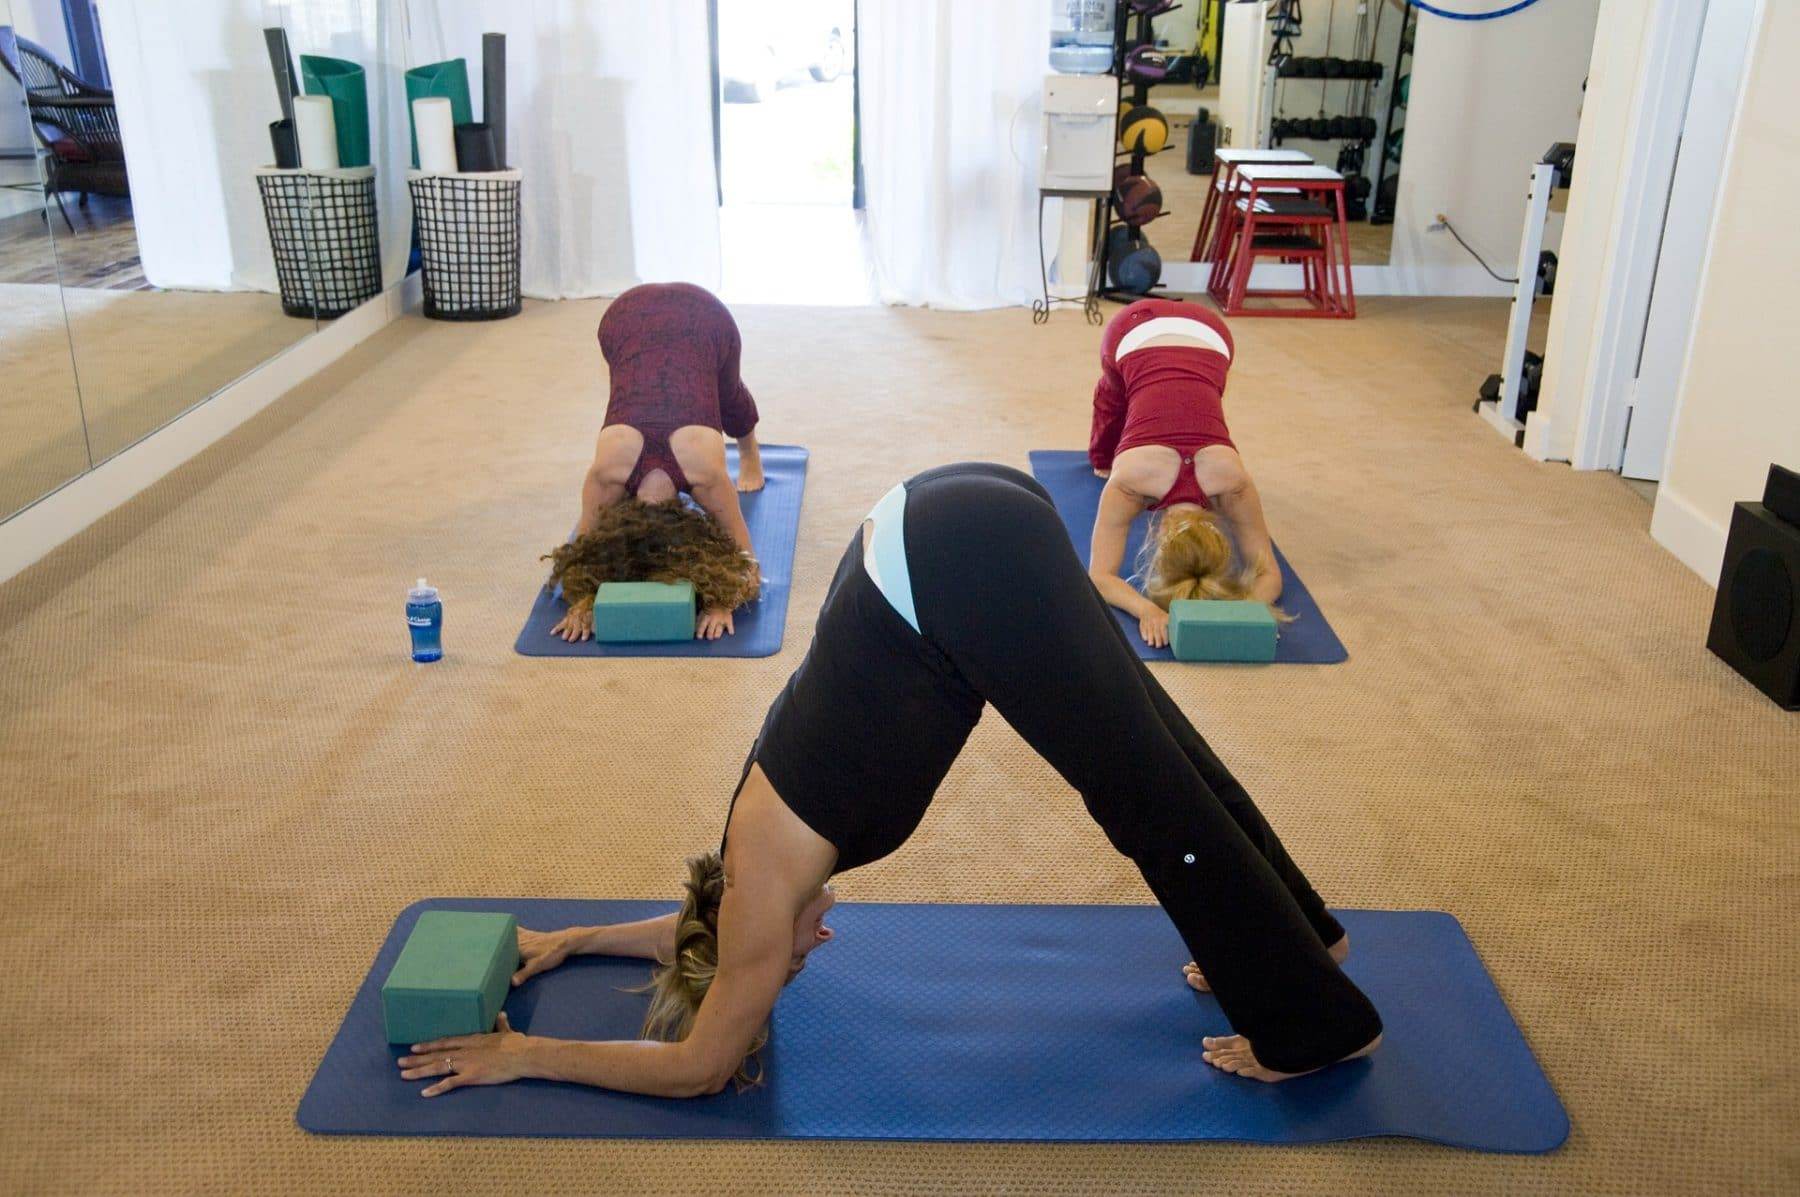 Drei Frauen beim Yoga im Studio